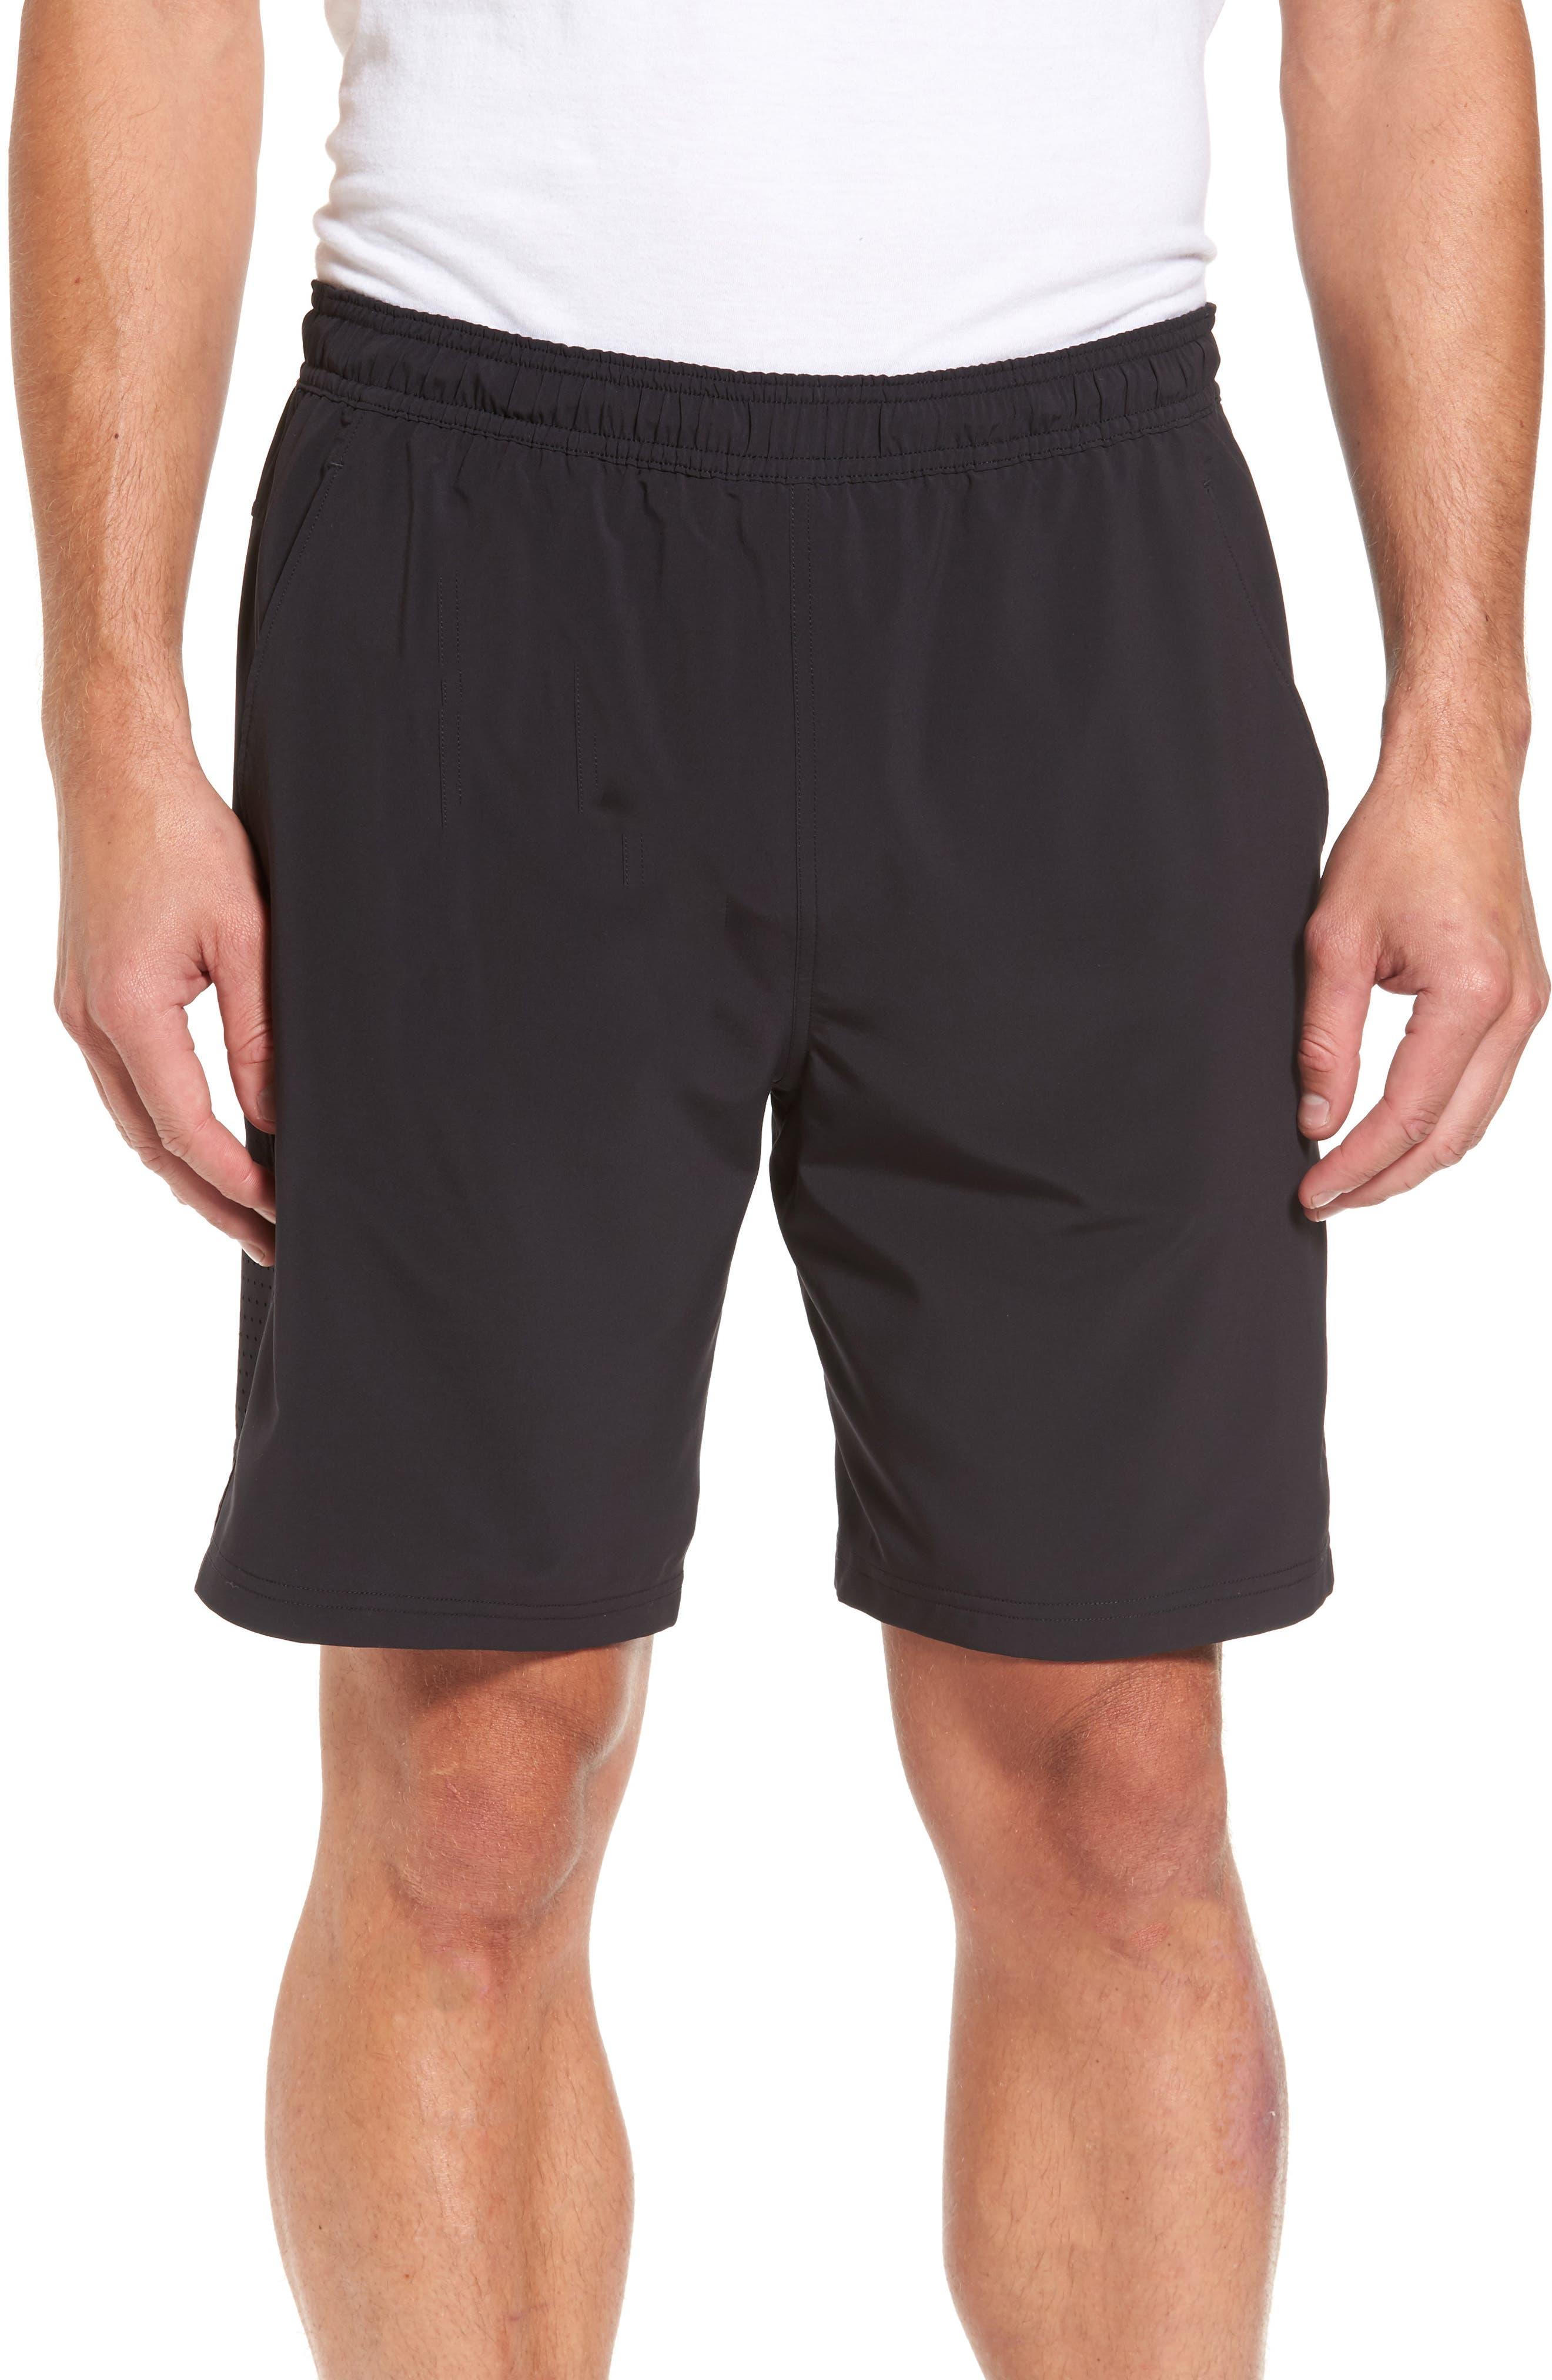 Alternate Image 1 Selected - Zella Graphite Core Athletic Shorts